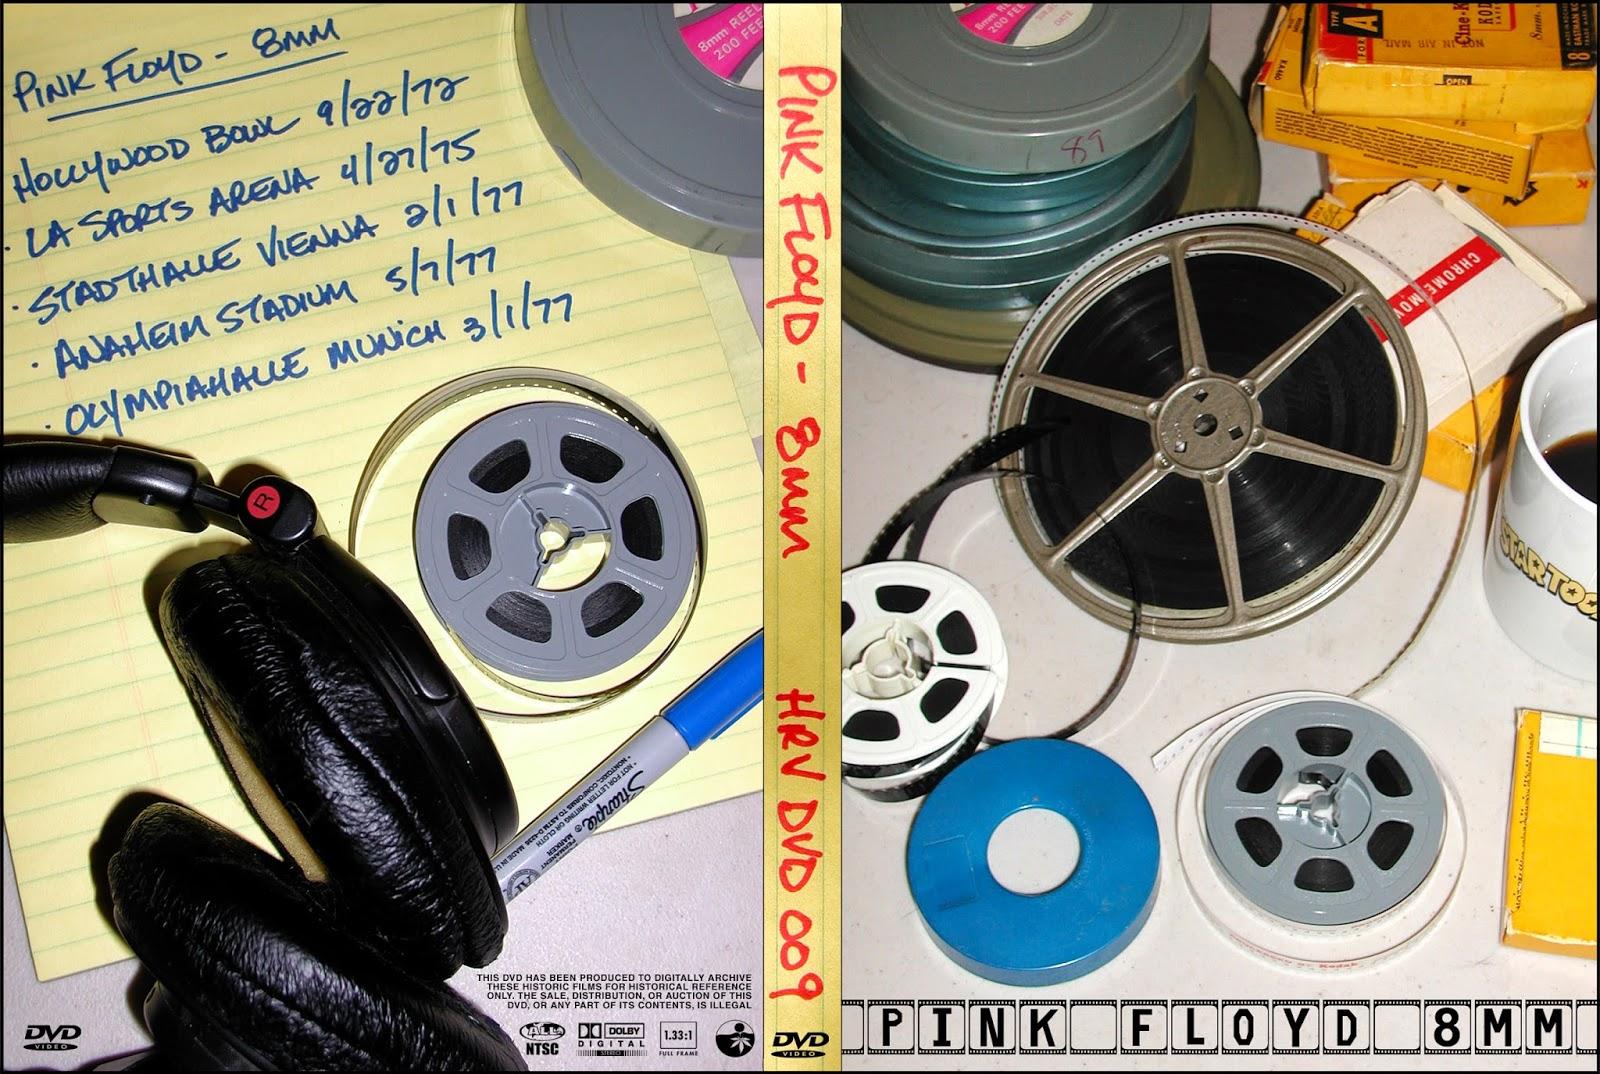 Plumdusty s page pink floyd 1975 06 12 spectrum theater philadelphia - Pink Floyd 8mm Harvested Records Hrv Dvd 009